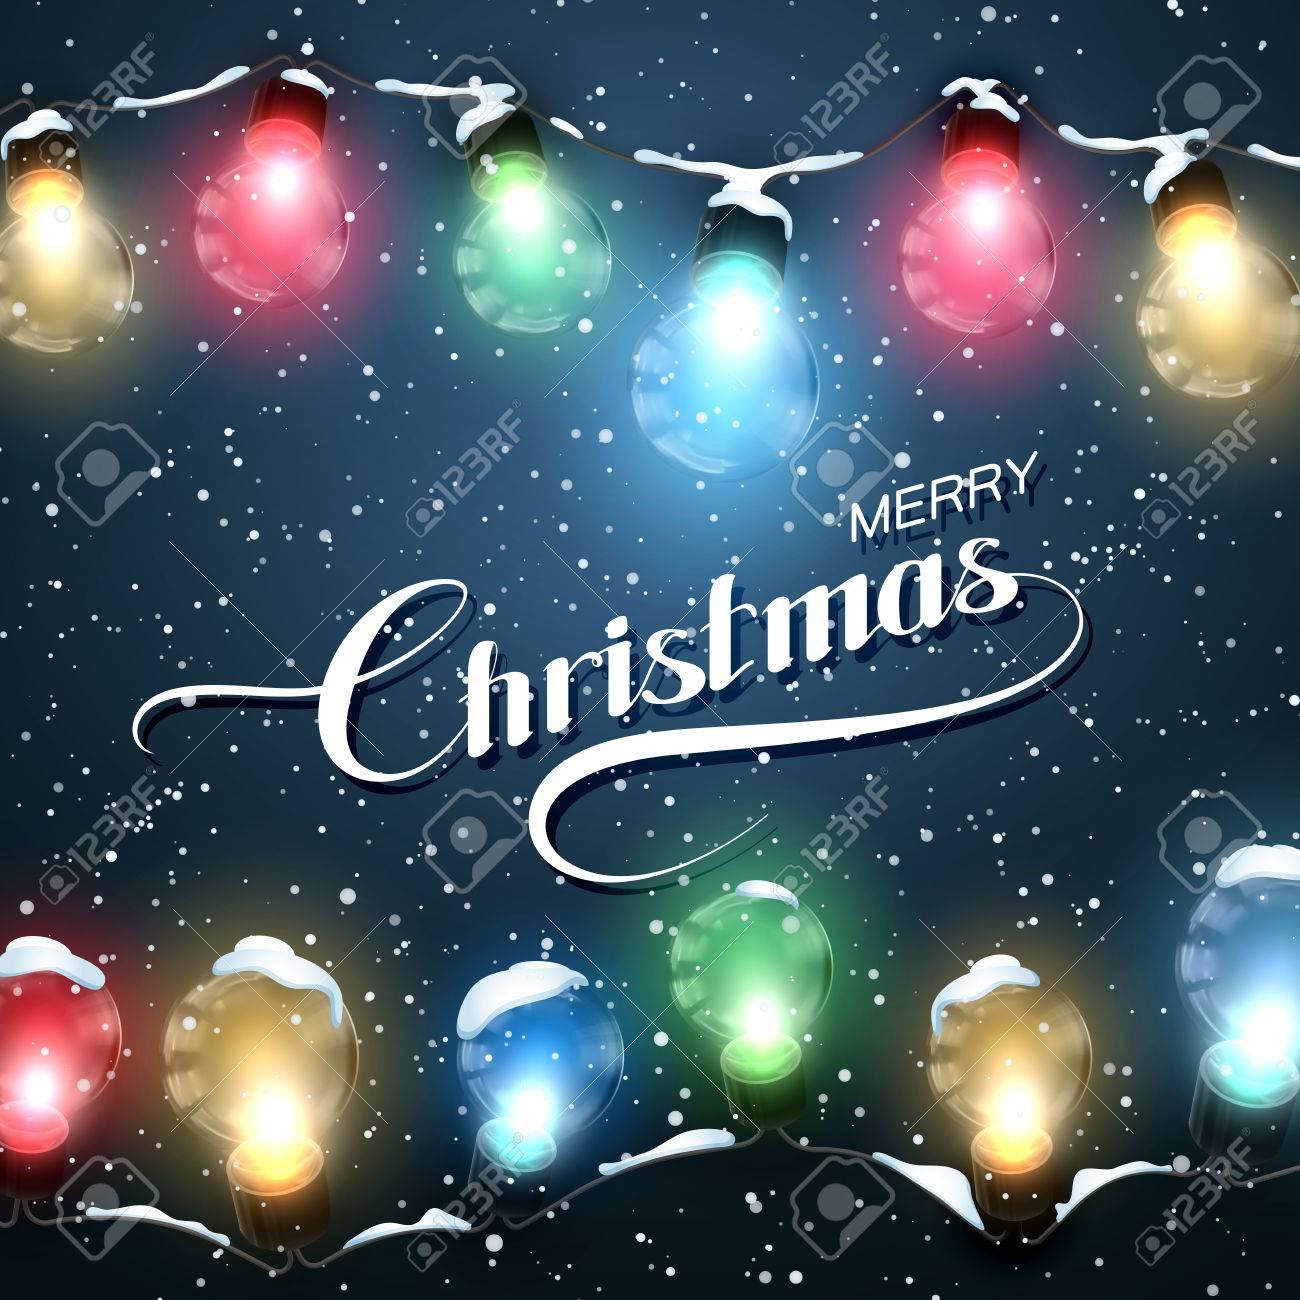 Merry Christmas Lights.Merry Christmas Christmas Lights With Snow Vector Holiday Illustration